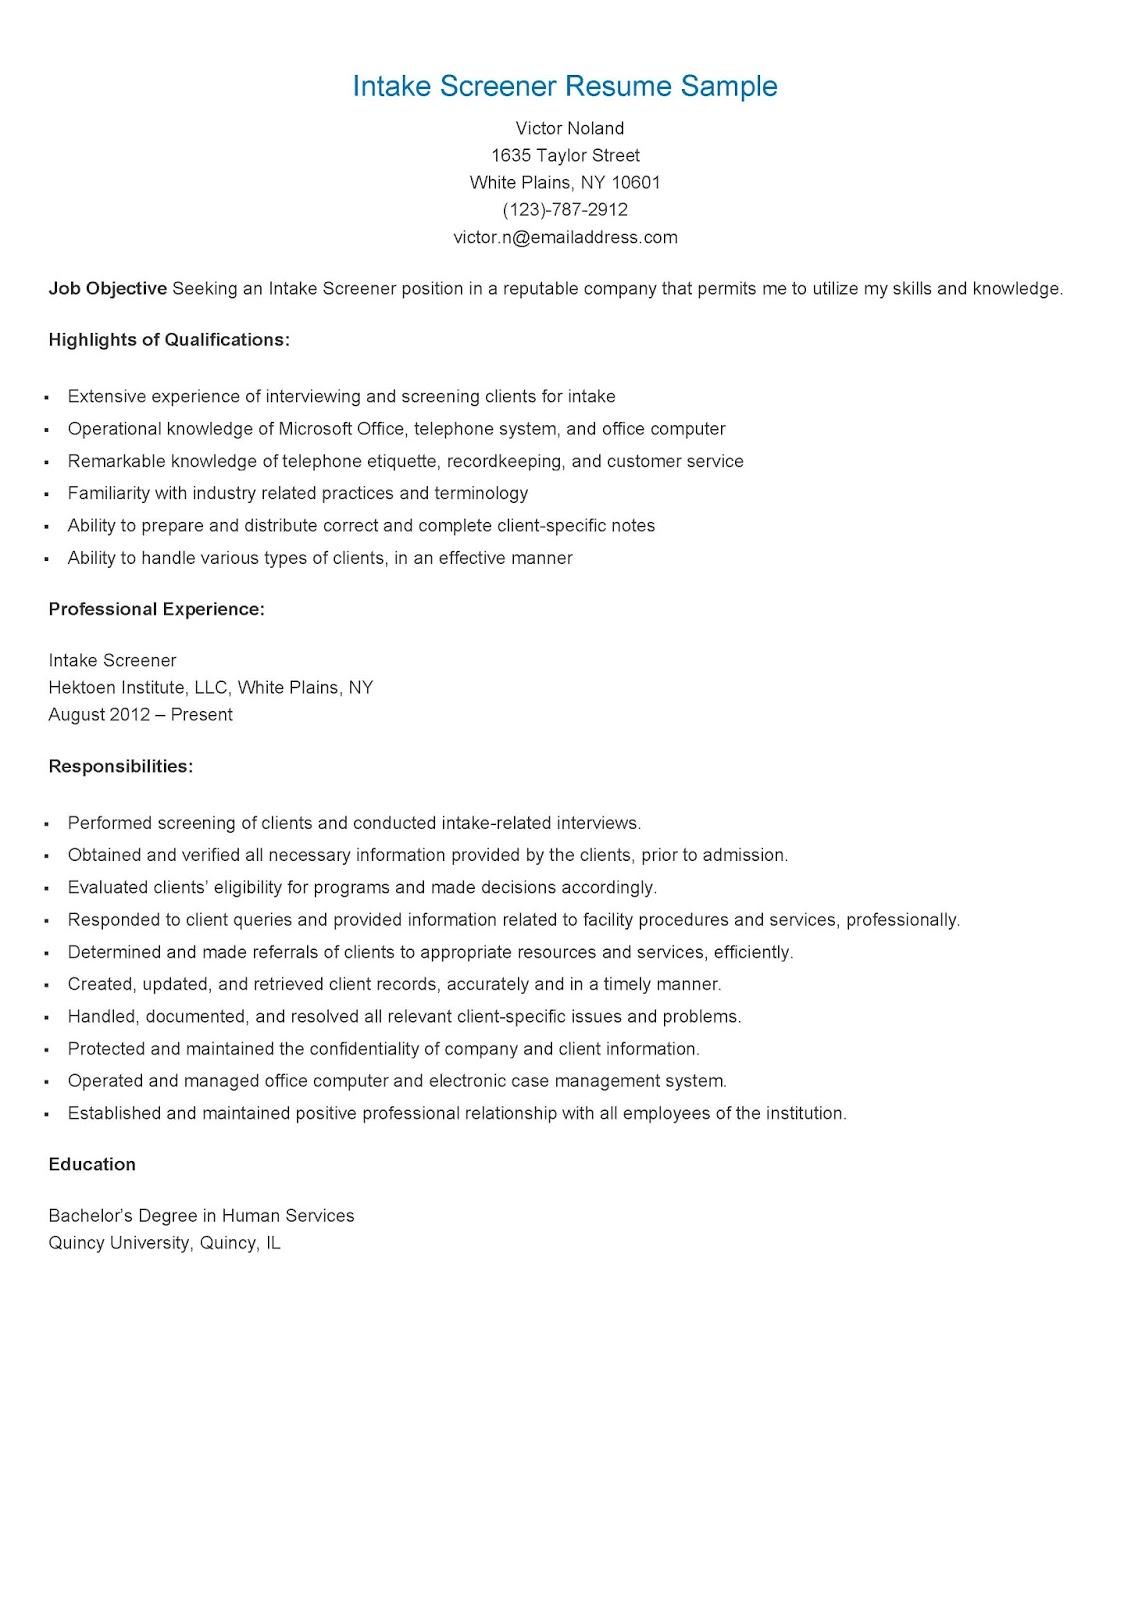 intake coordinatot resume sample